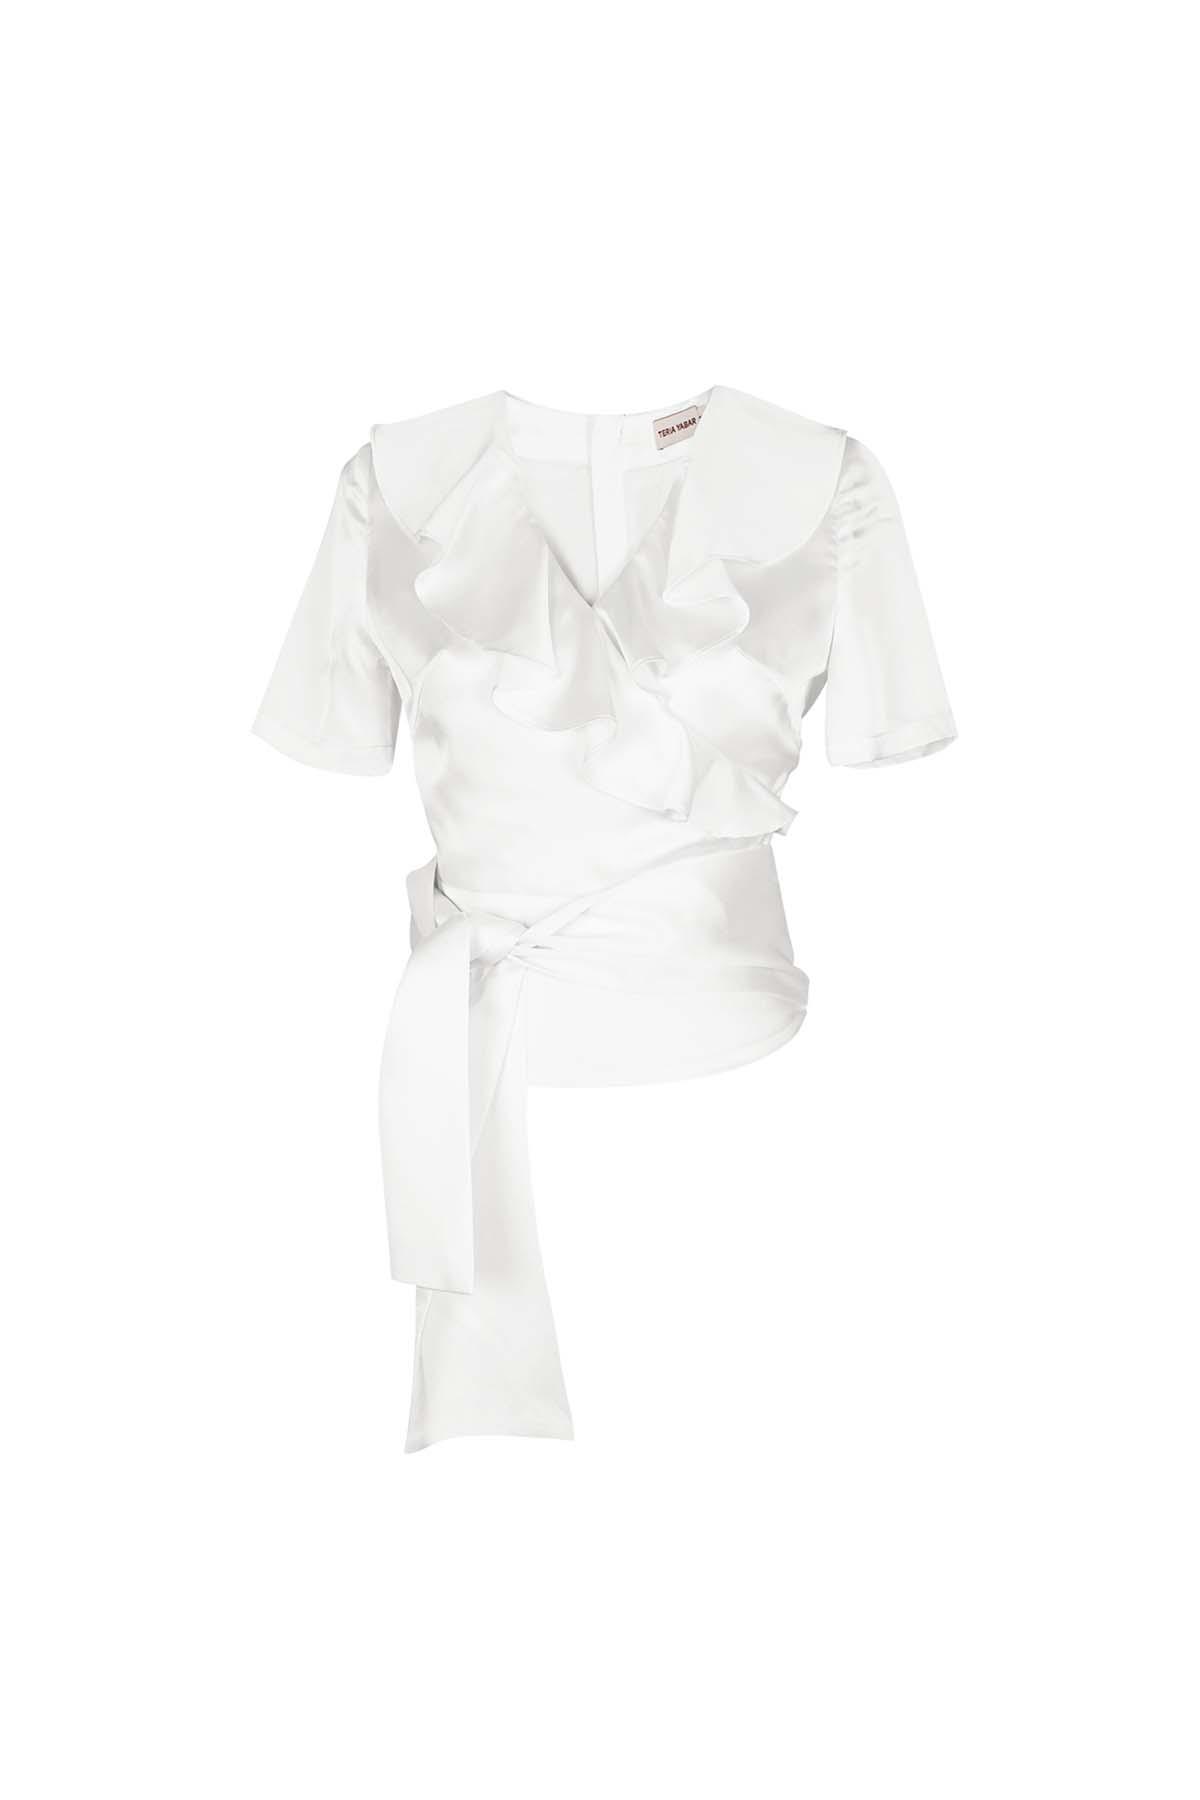 Teria Yabar - Top blanco de escote cruzado